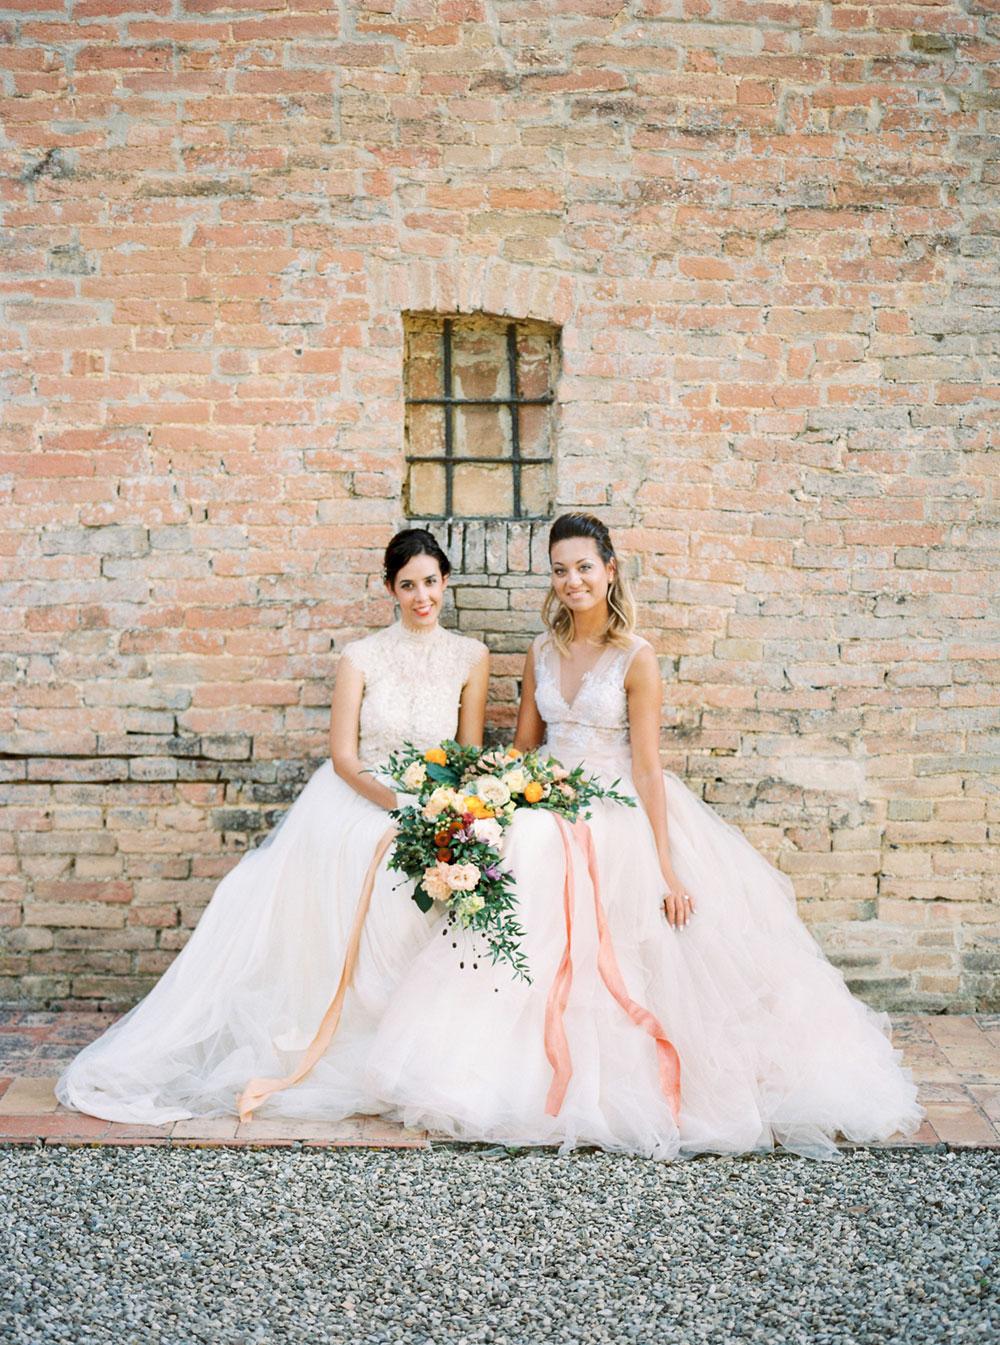 Linari-Tuscany-Elopement-Courtney-Michaela-110